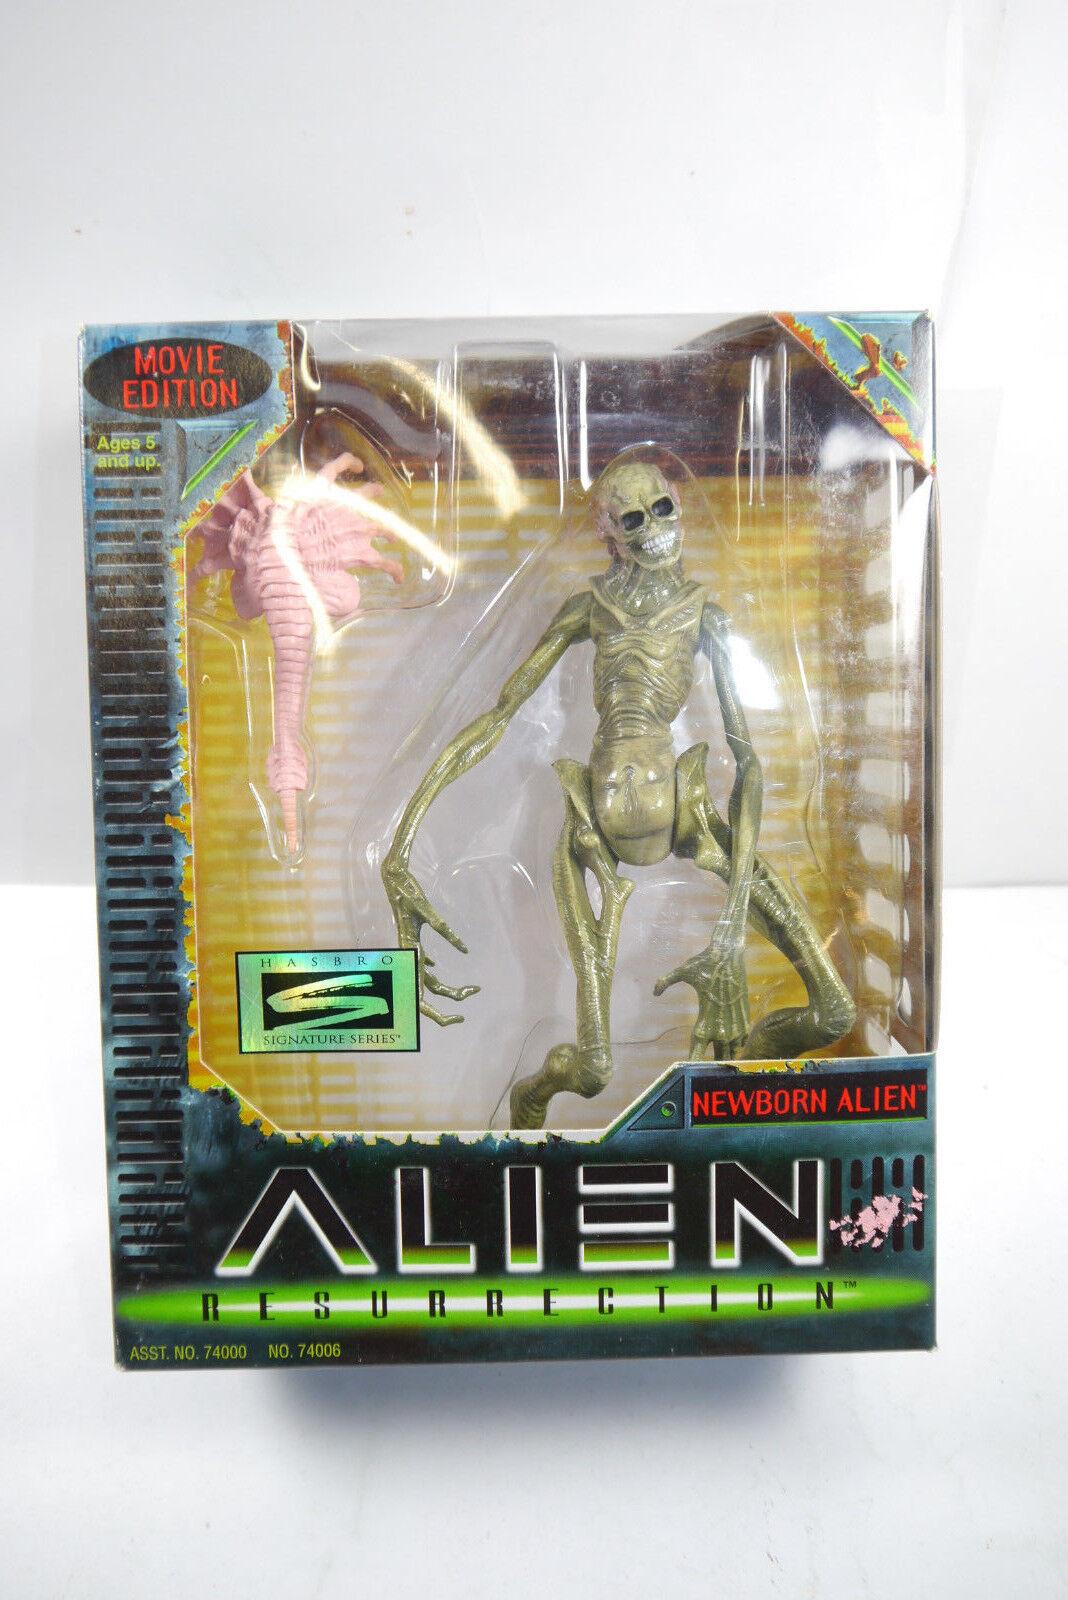 Alien Resurrection Newborn Alien Action Figure Kenner Approx. 18 cm NEW L